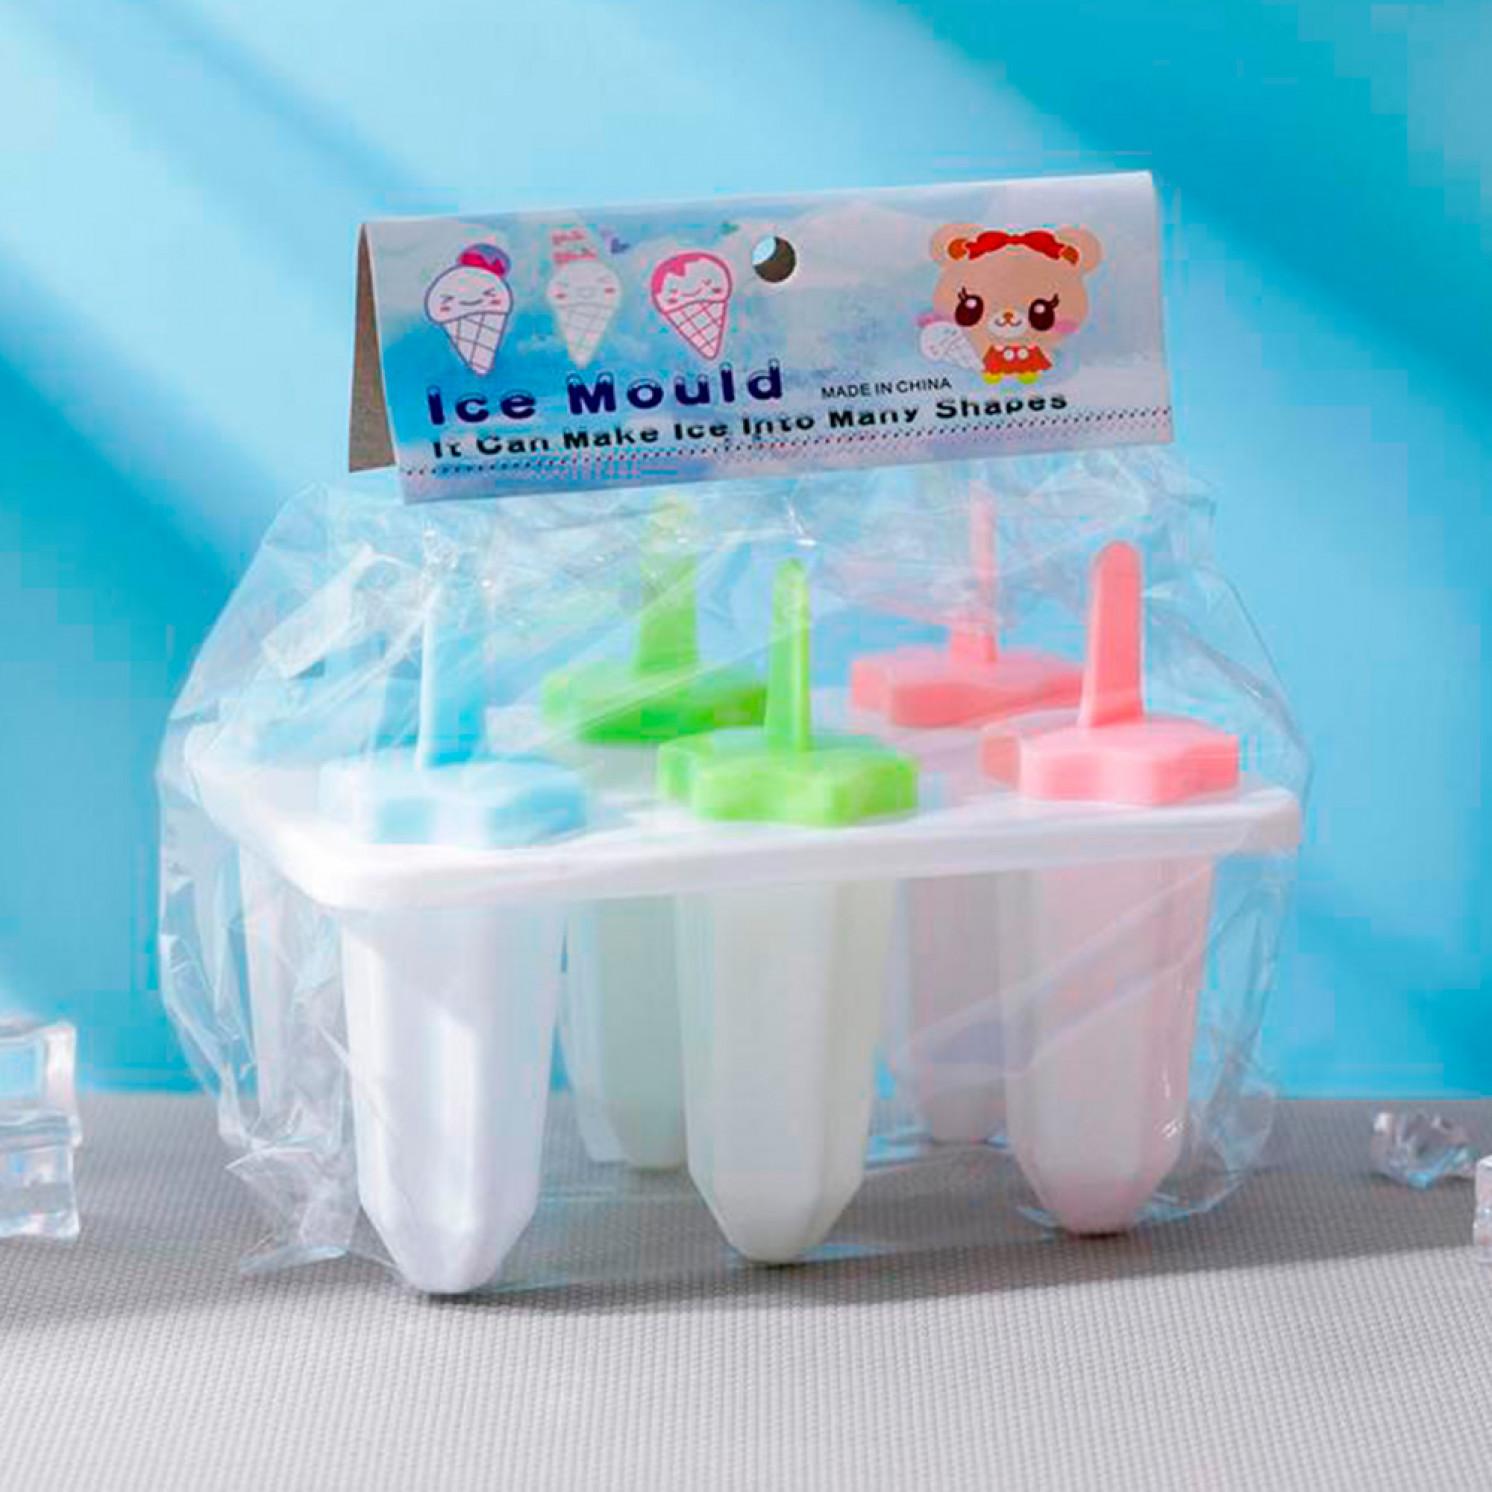 "Форма для мороженого ""Звезда"", 6 ячеек, палочки в комплекте, цвета МИКС"